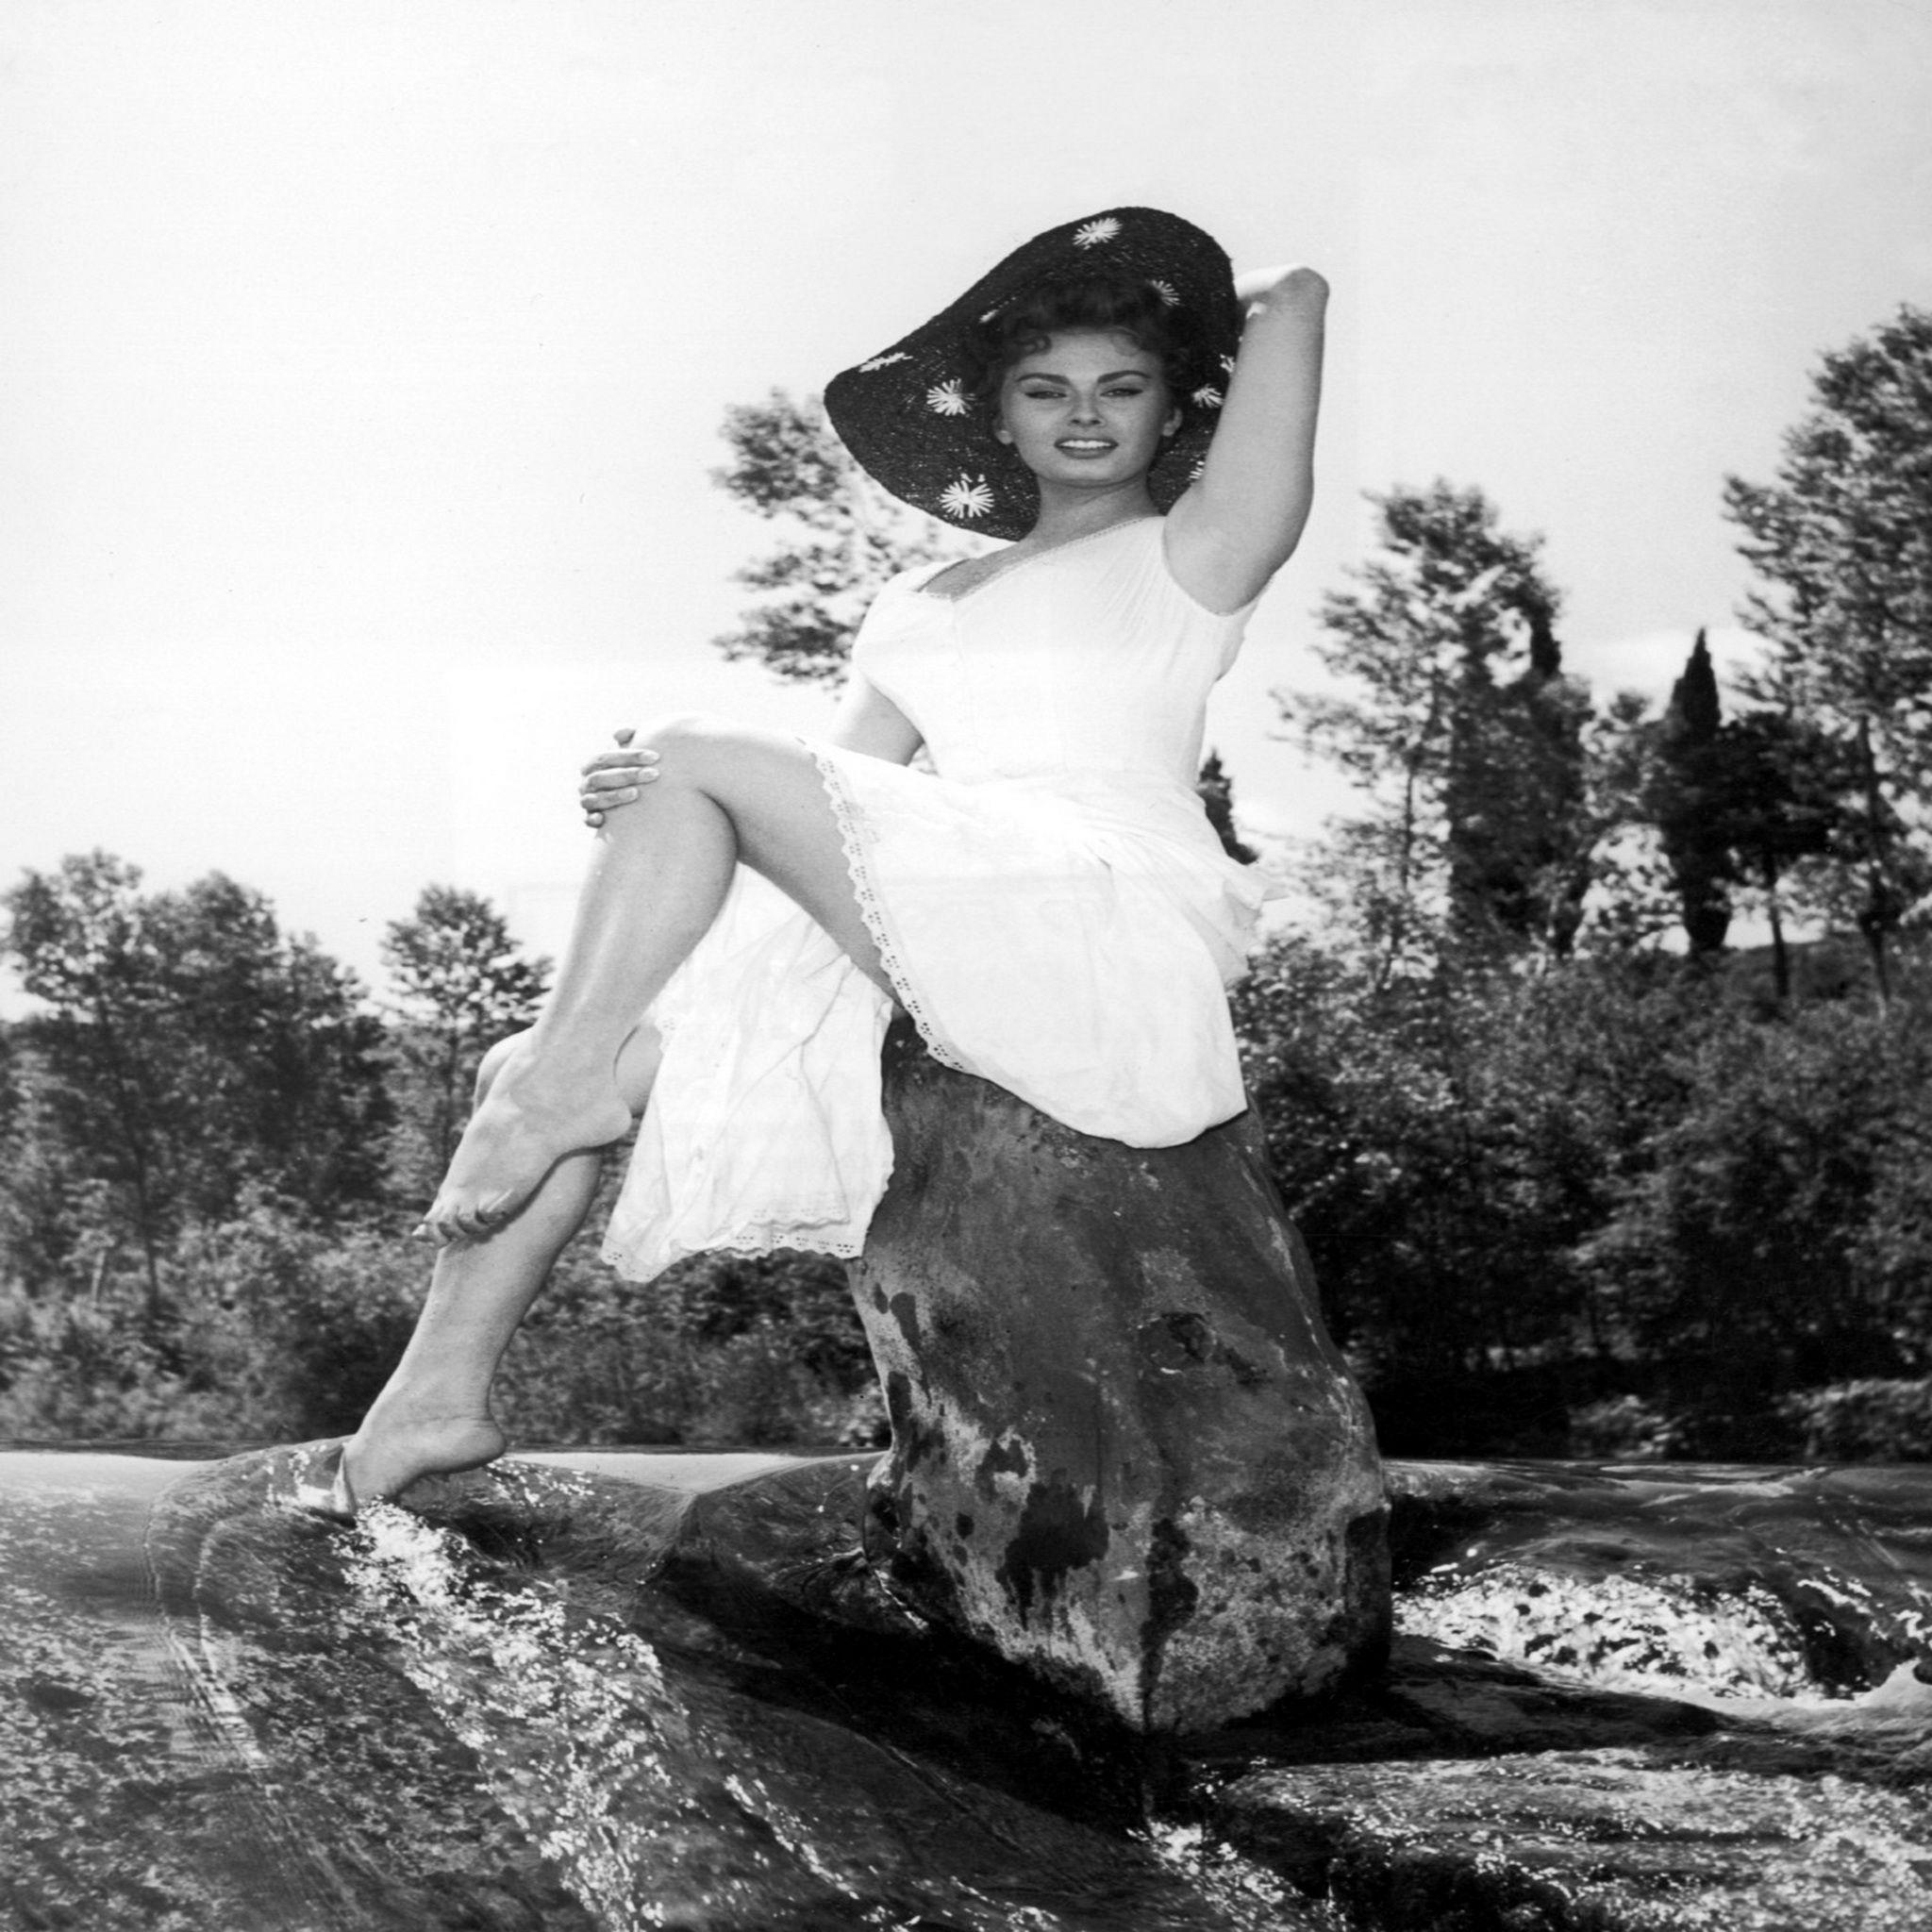 1955: Italian actor Sophia Loren poses barefoot on a rock in a ...